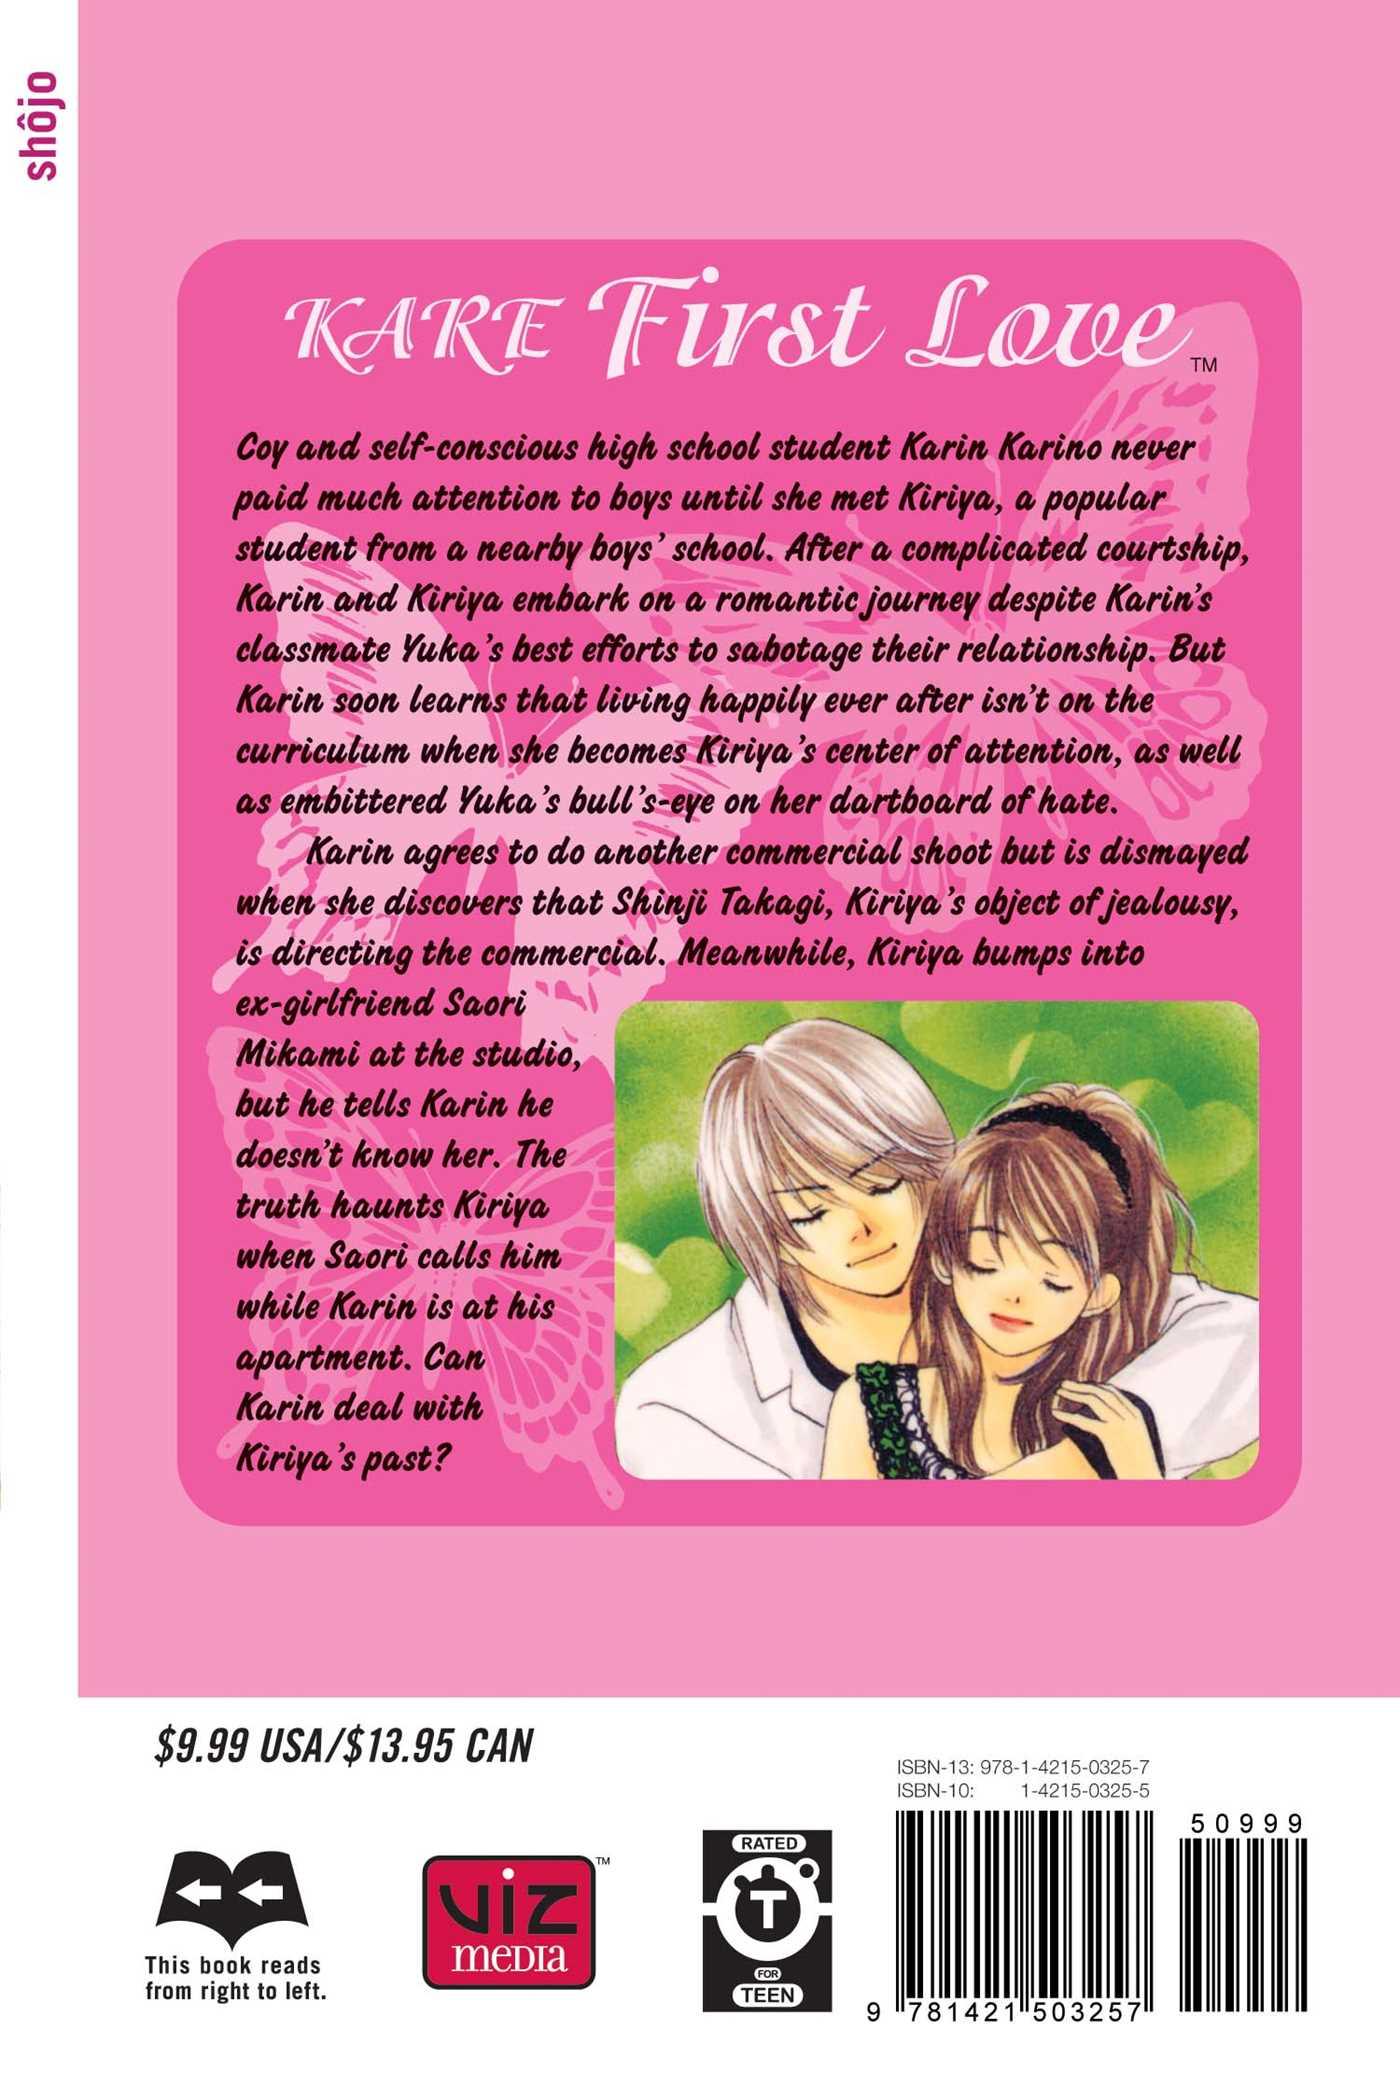 Kare first love vol 7 9781421503257 hr back